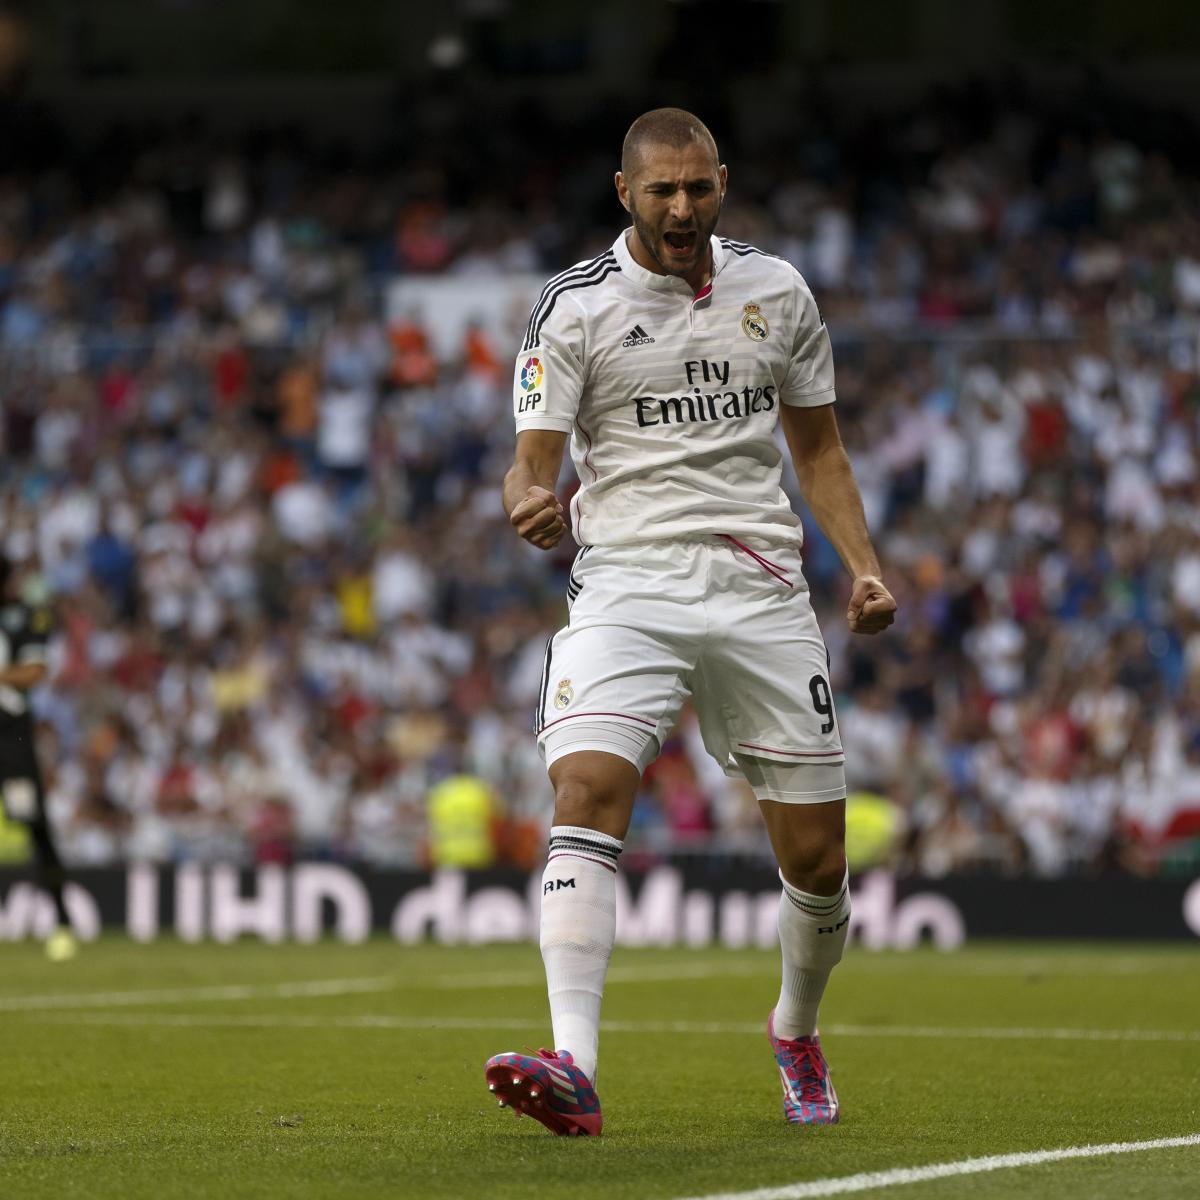 Real Sociedad Vs Real Madrid Live Stream